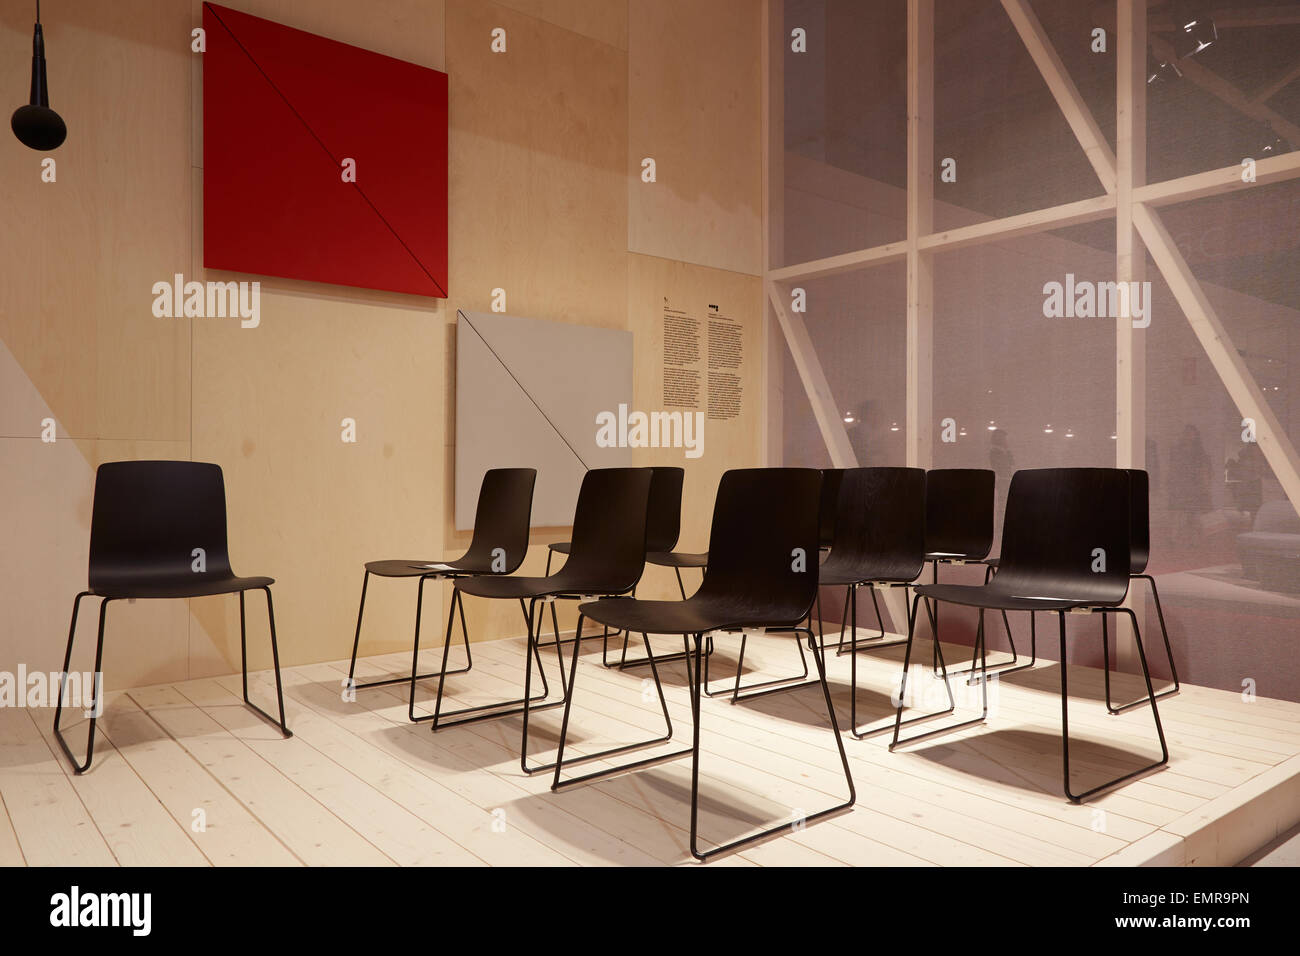 Milan italy april 14 milan design week arper stand at for Salone del mobile vitra